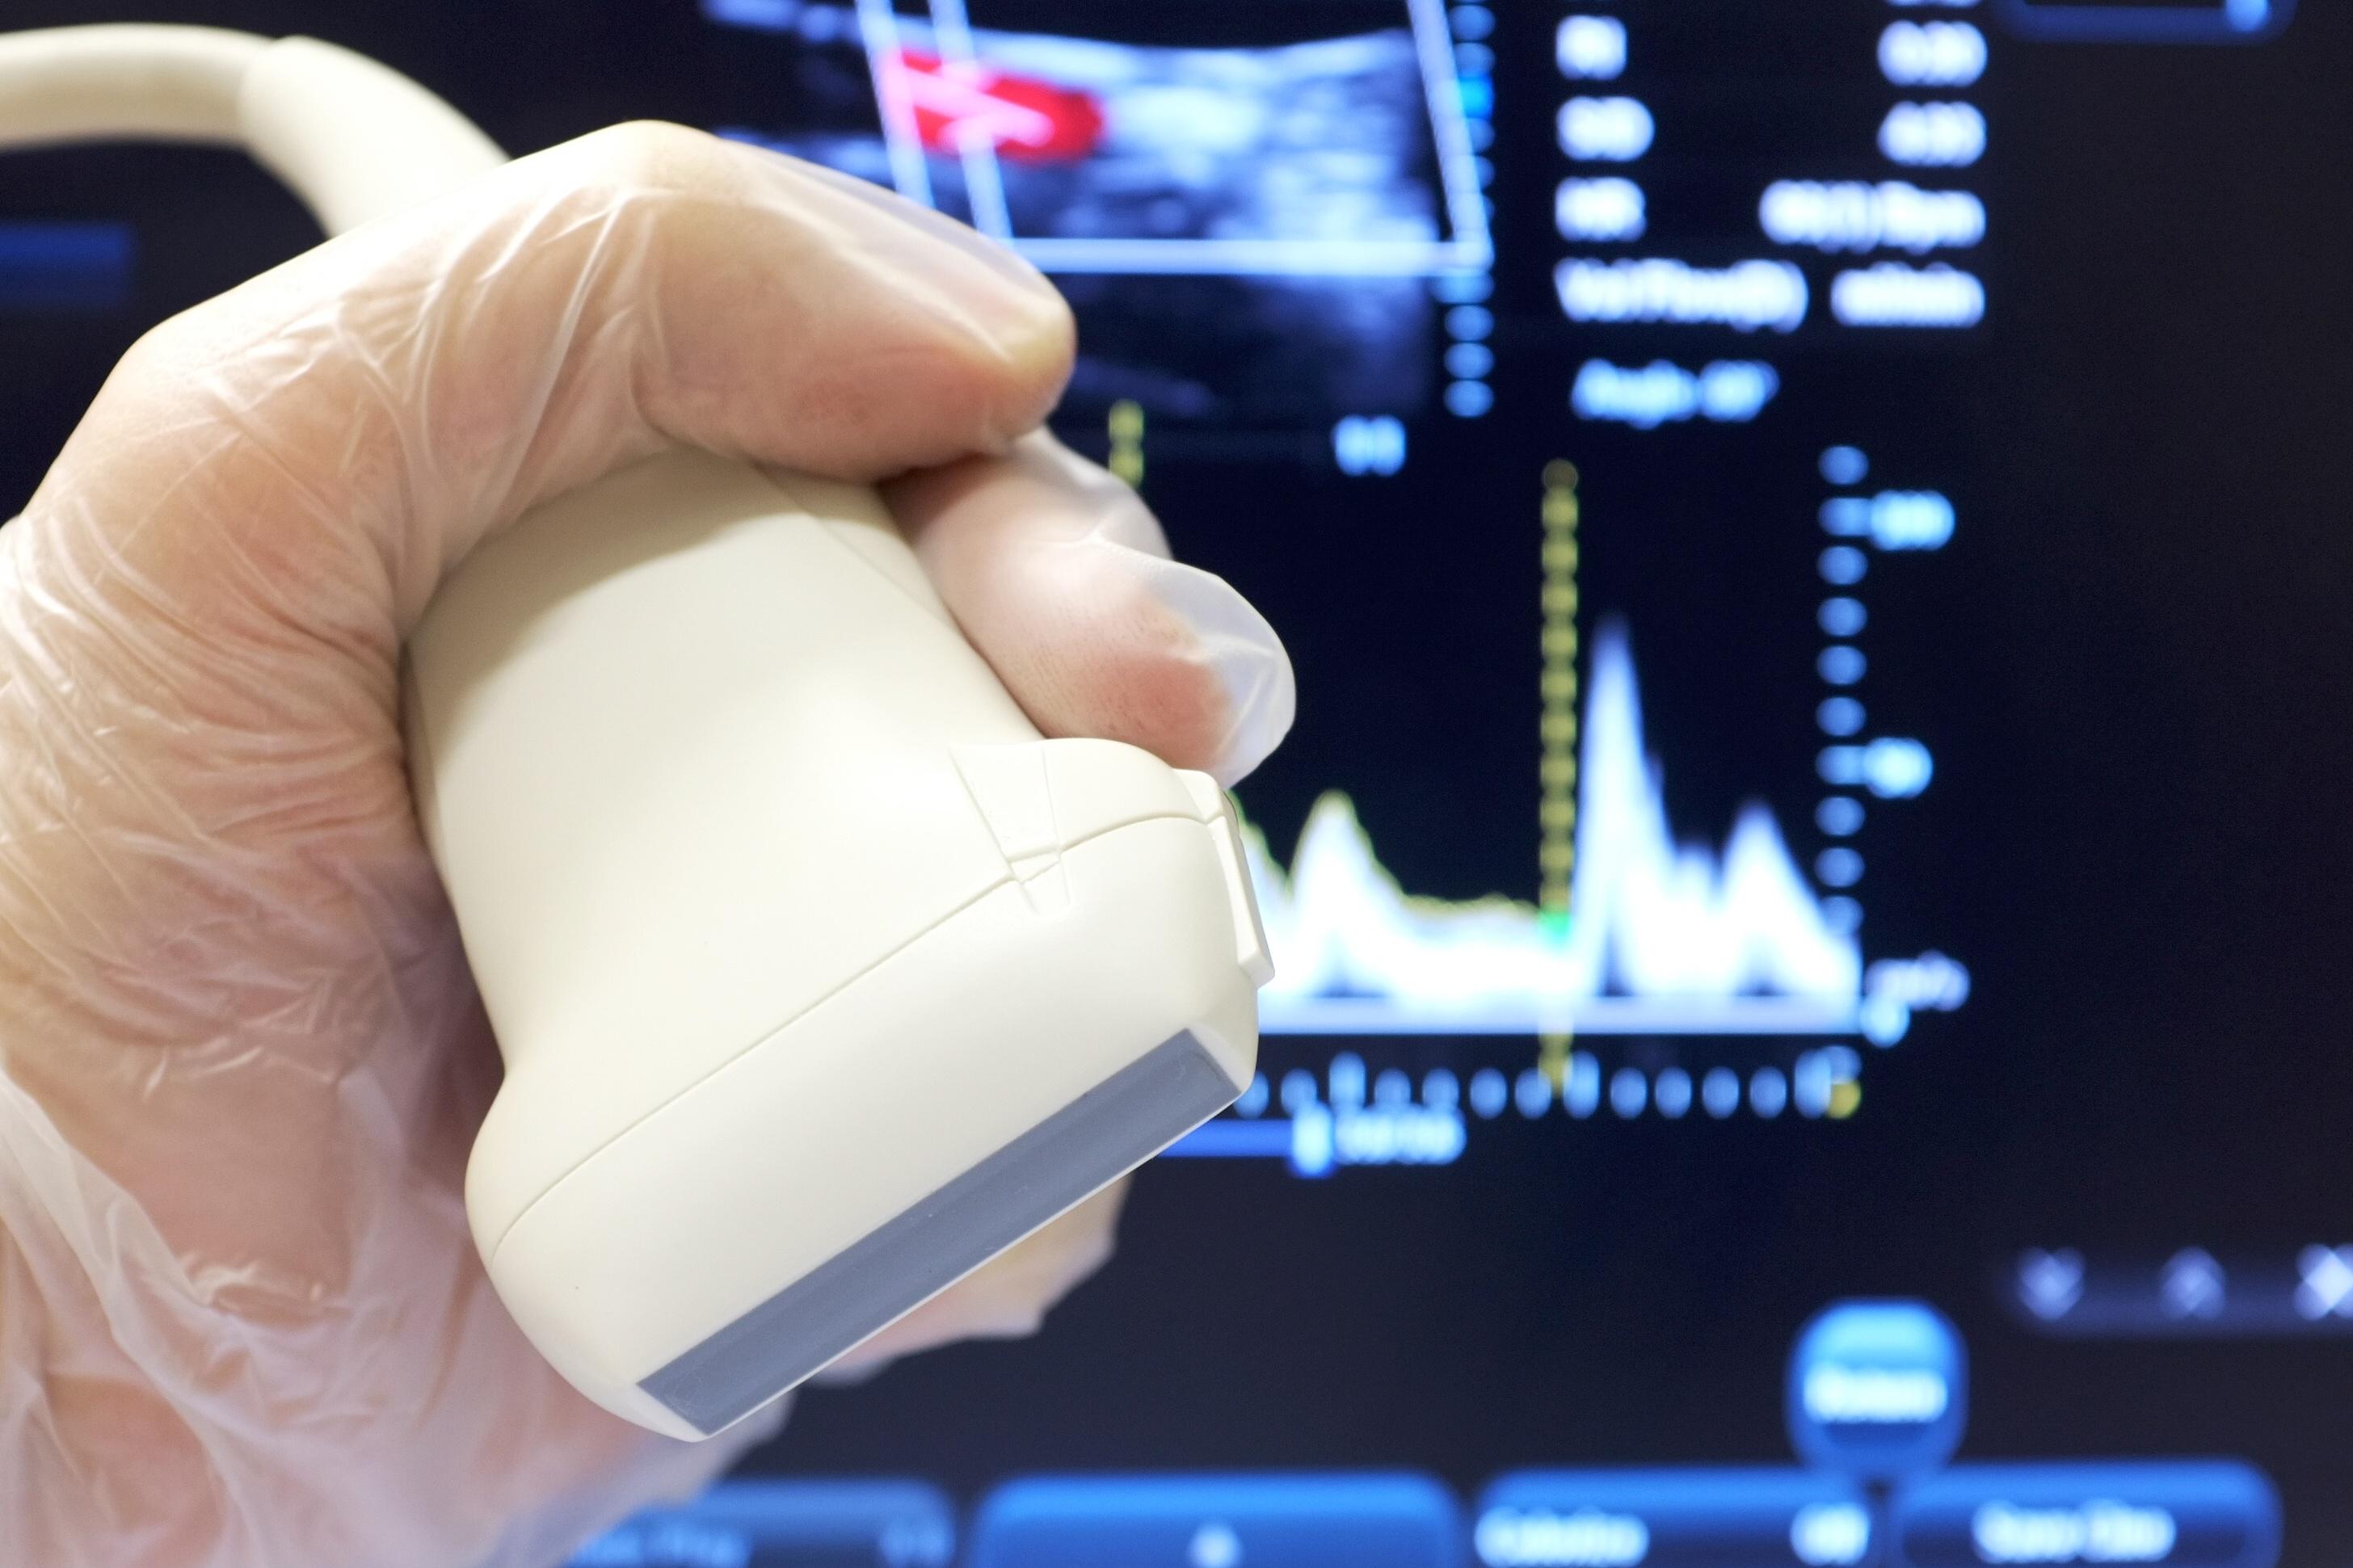 Linear ultrasound probe with vascular doppler exam in background